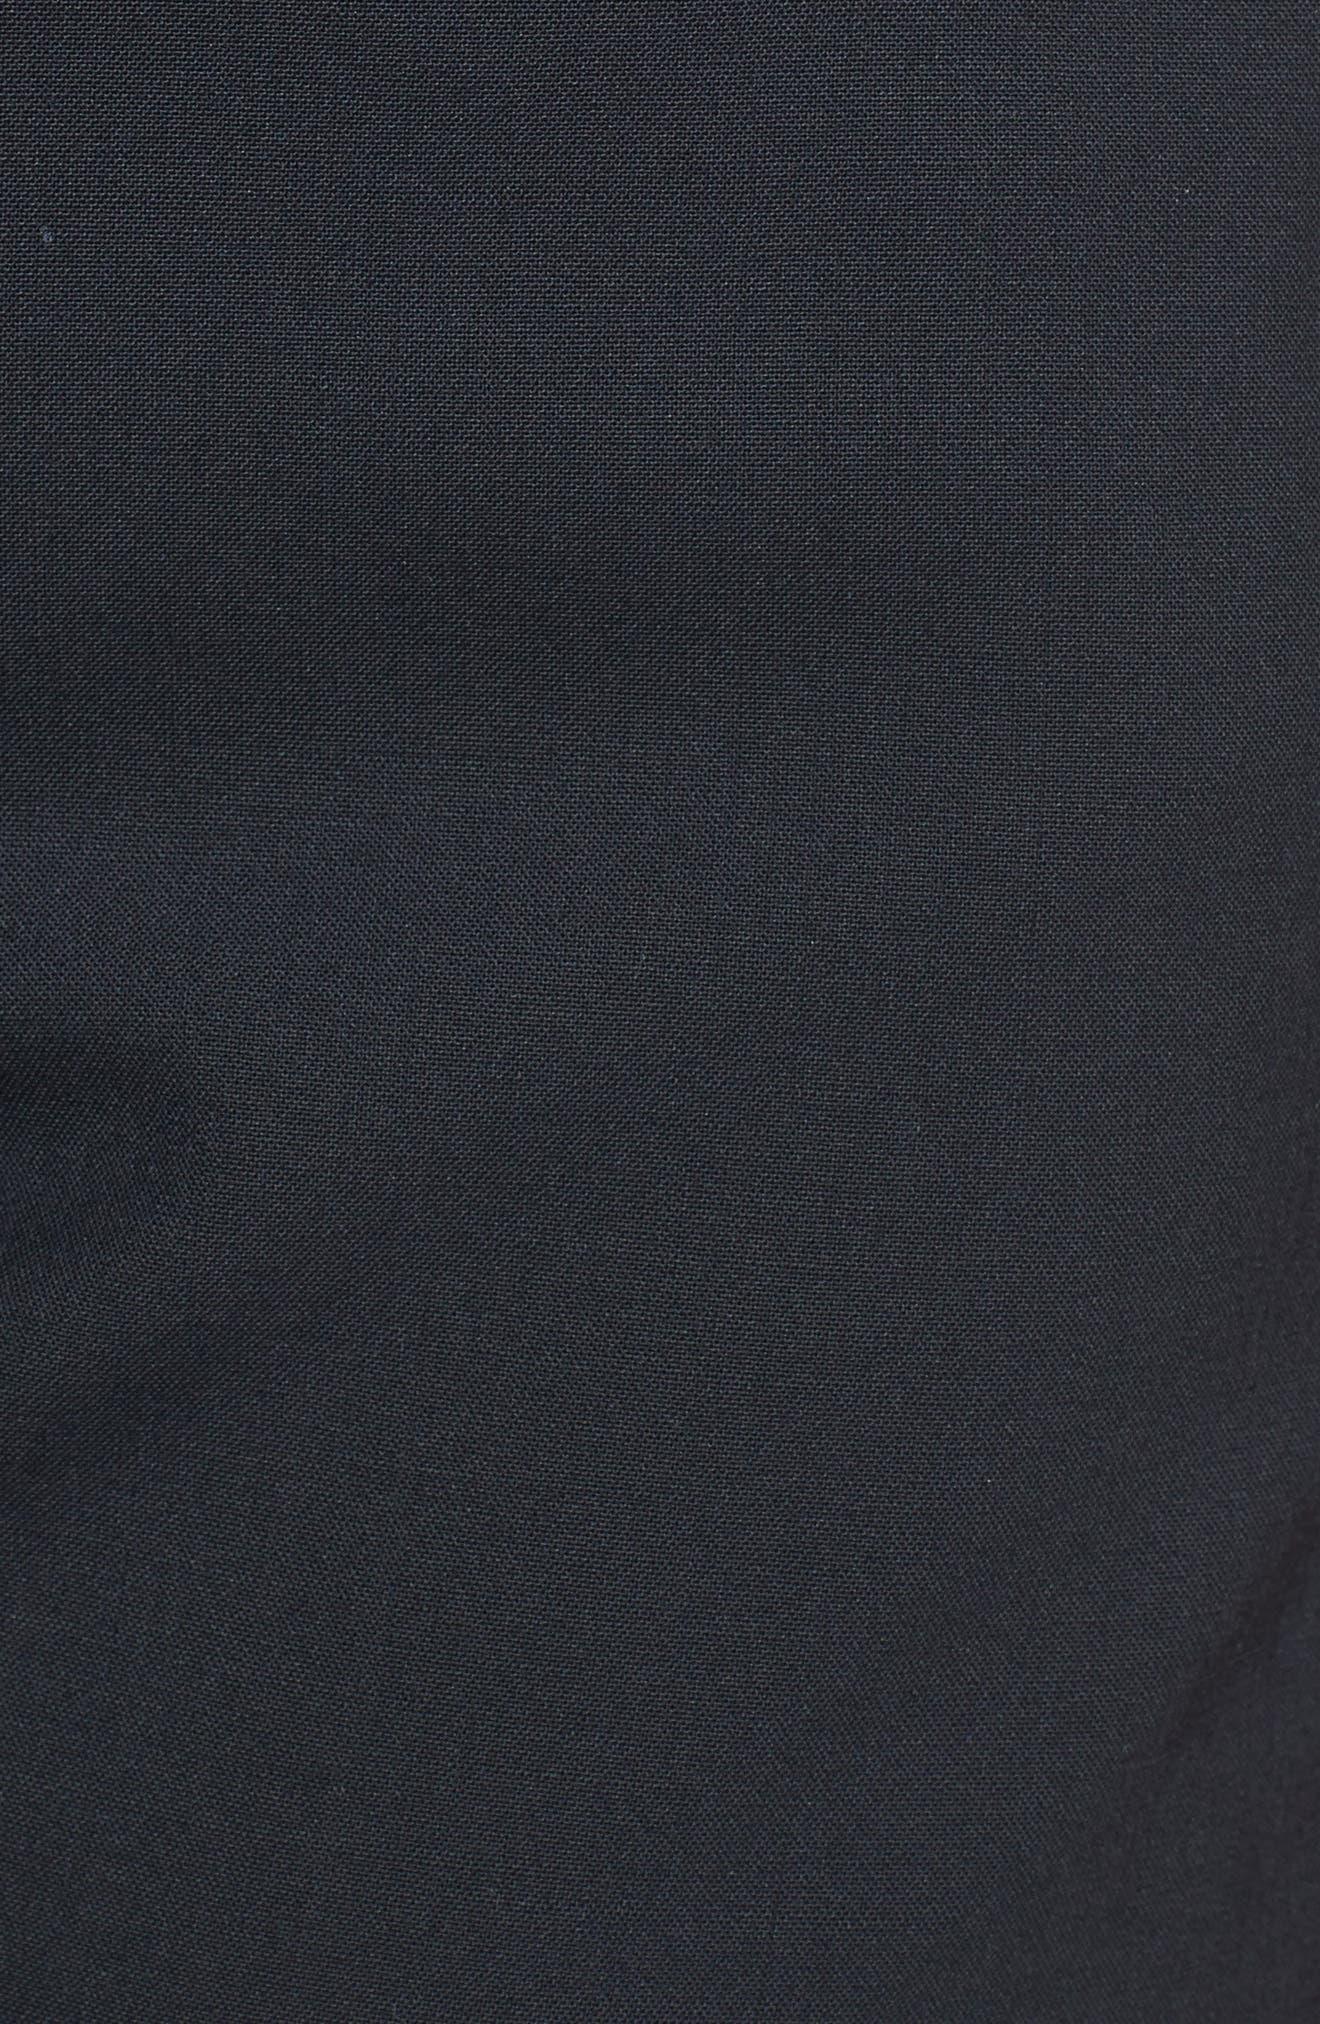 Stretch Wool Tuxedo Pants,                             Alternate thumbnail 3, color,                             BLACK